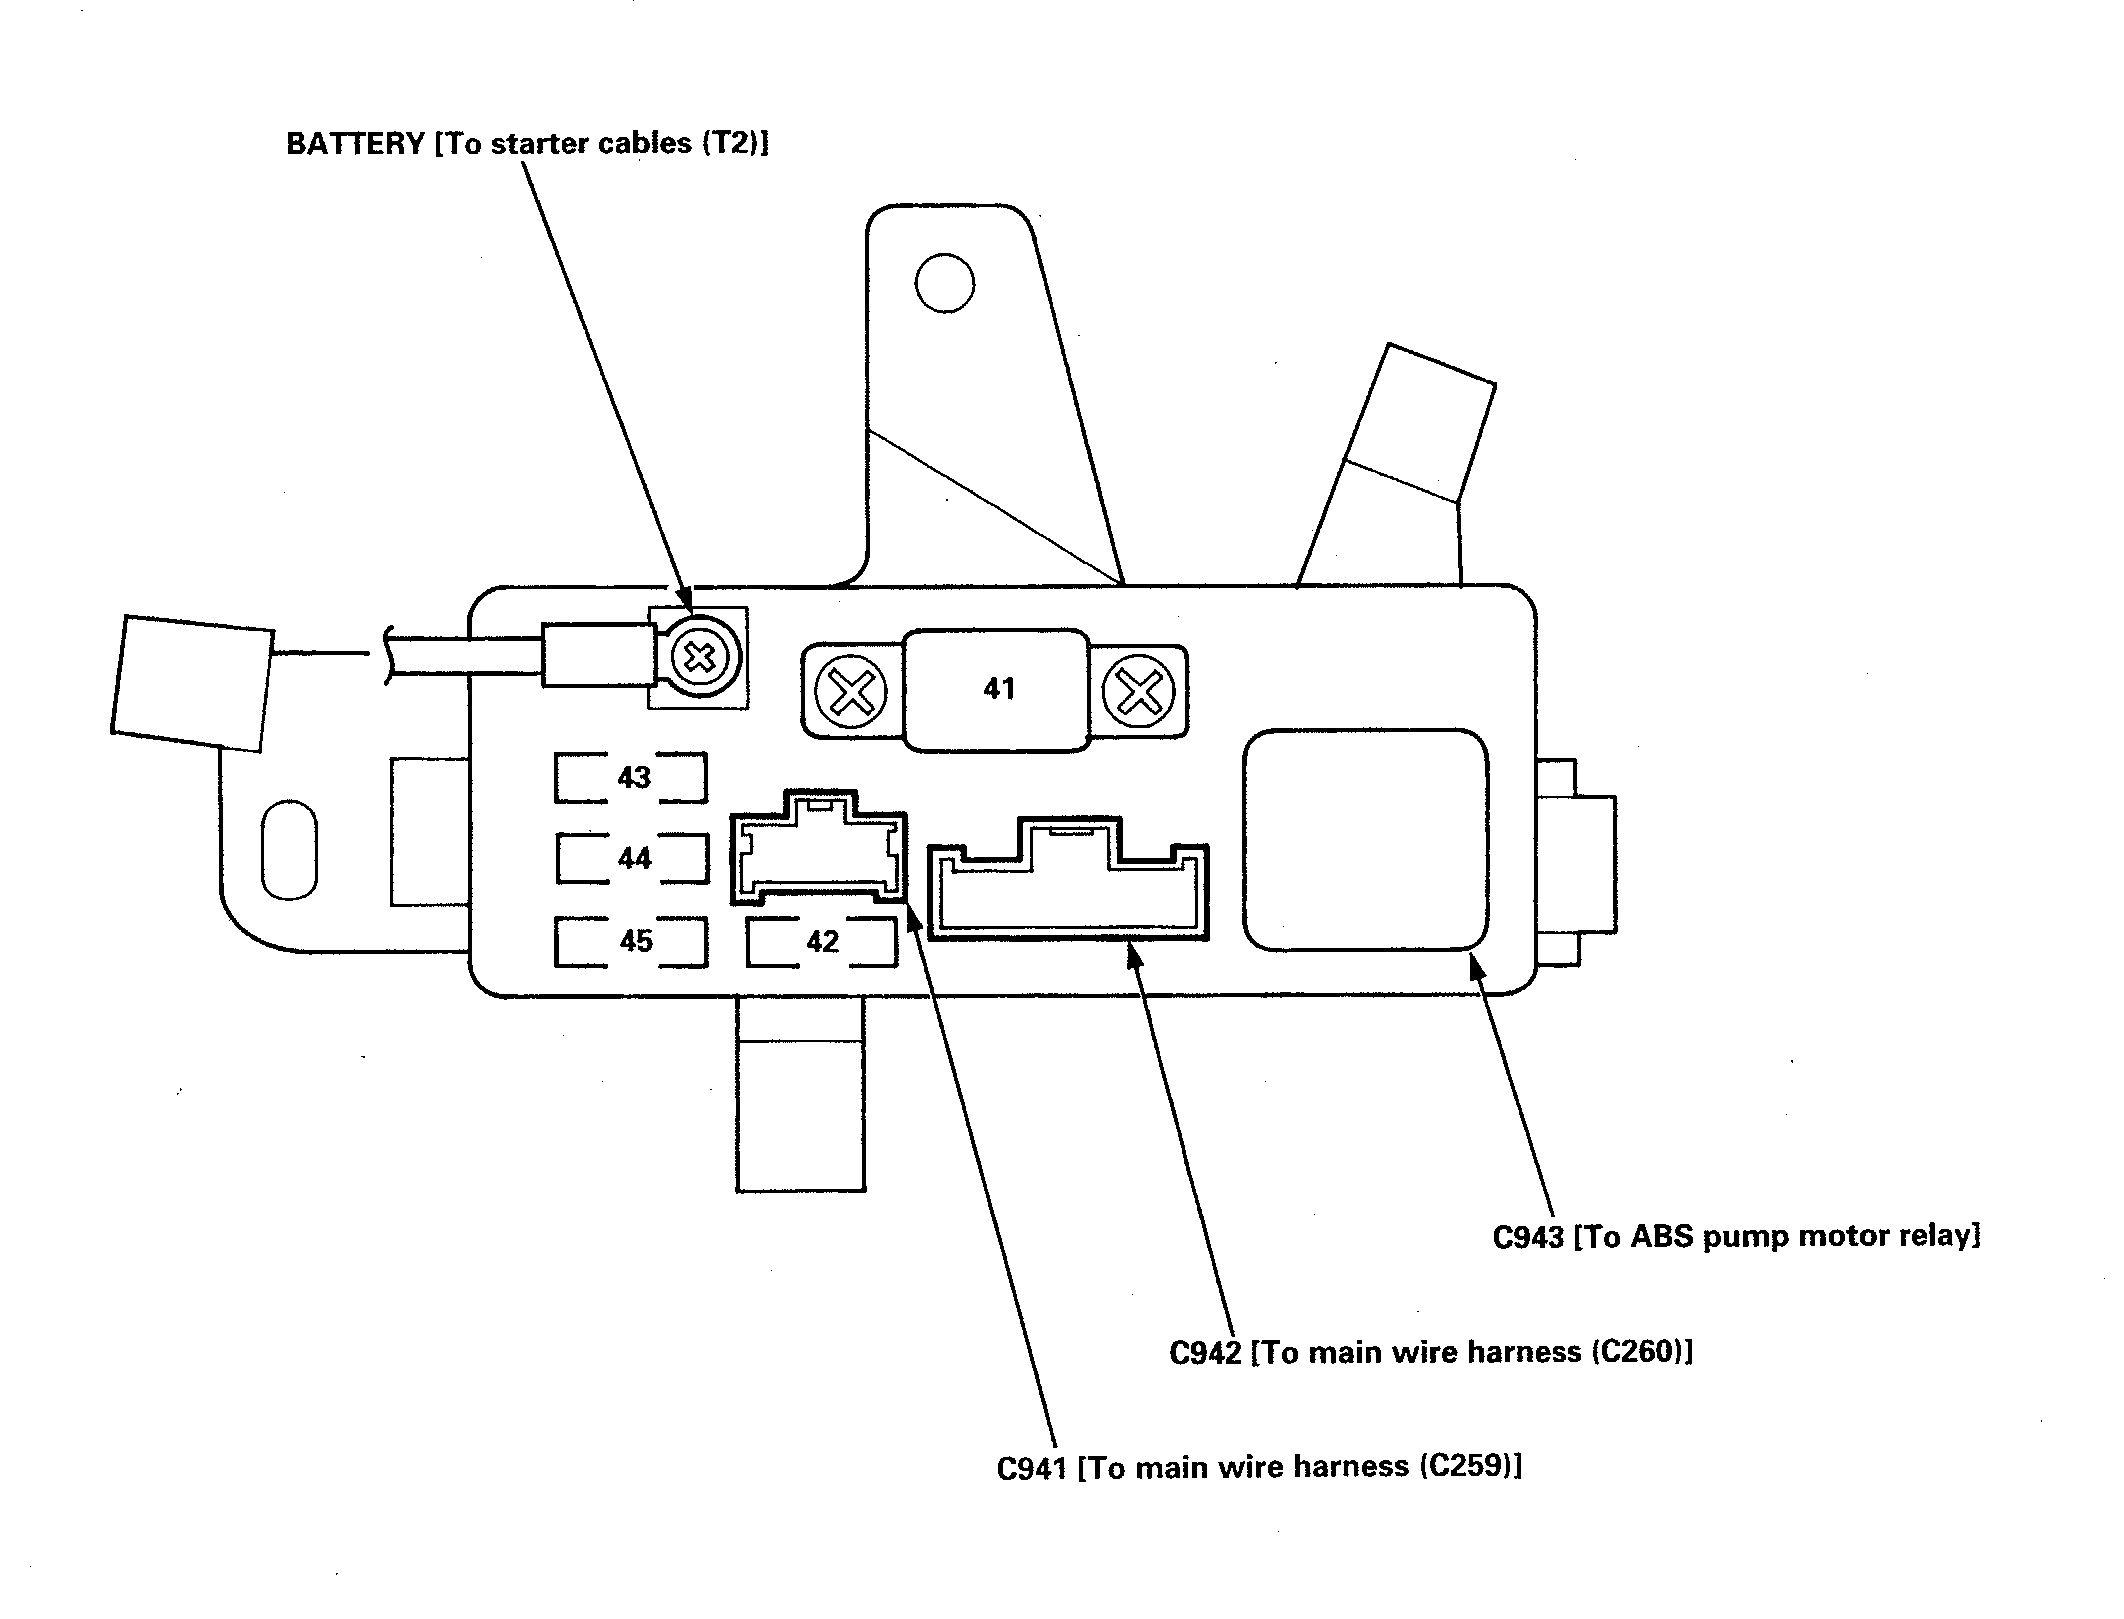 Isuzu Npr Battery Diagram